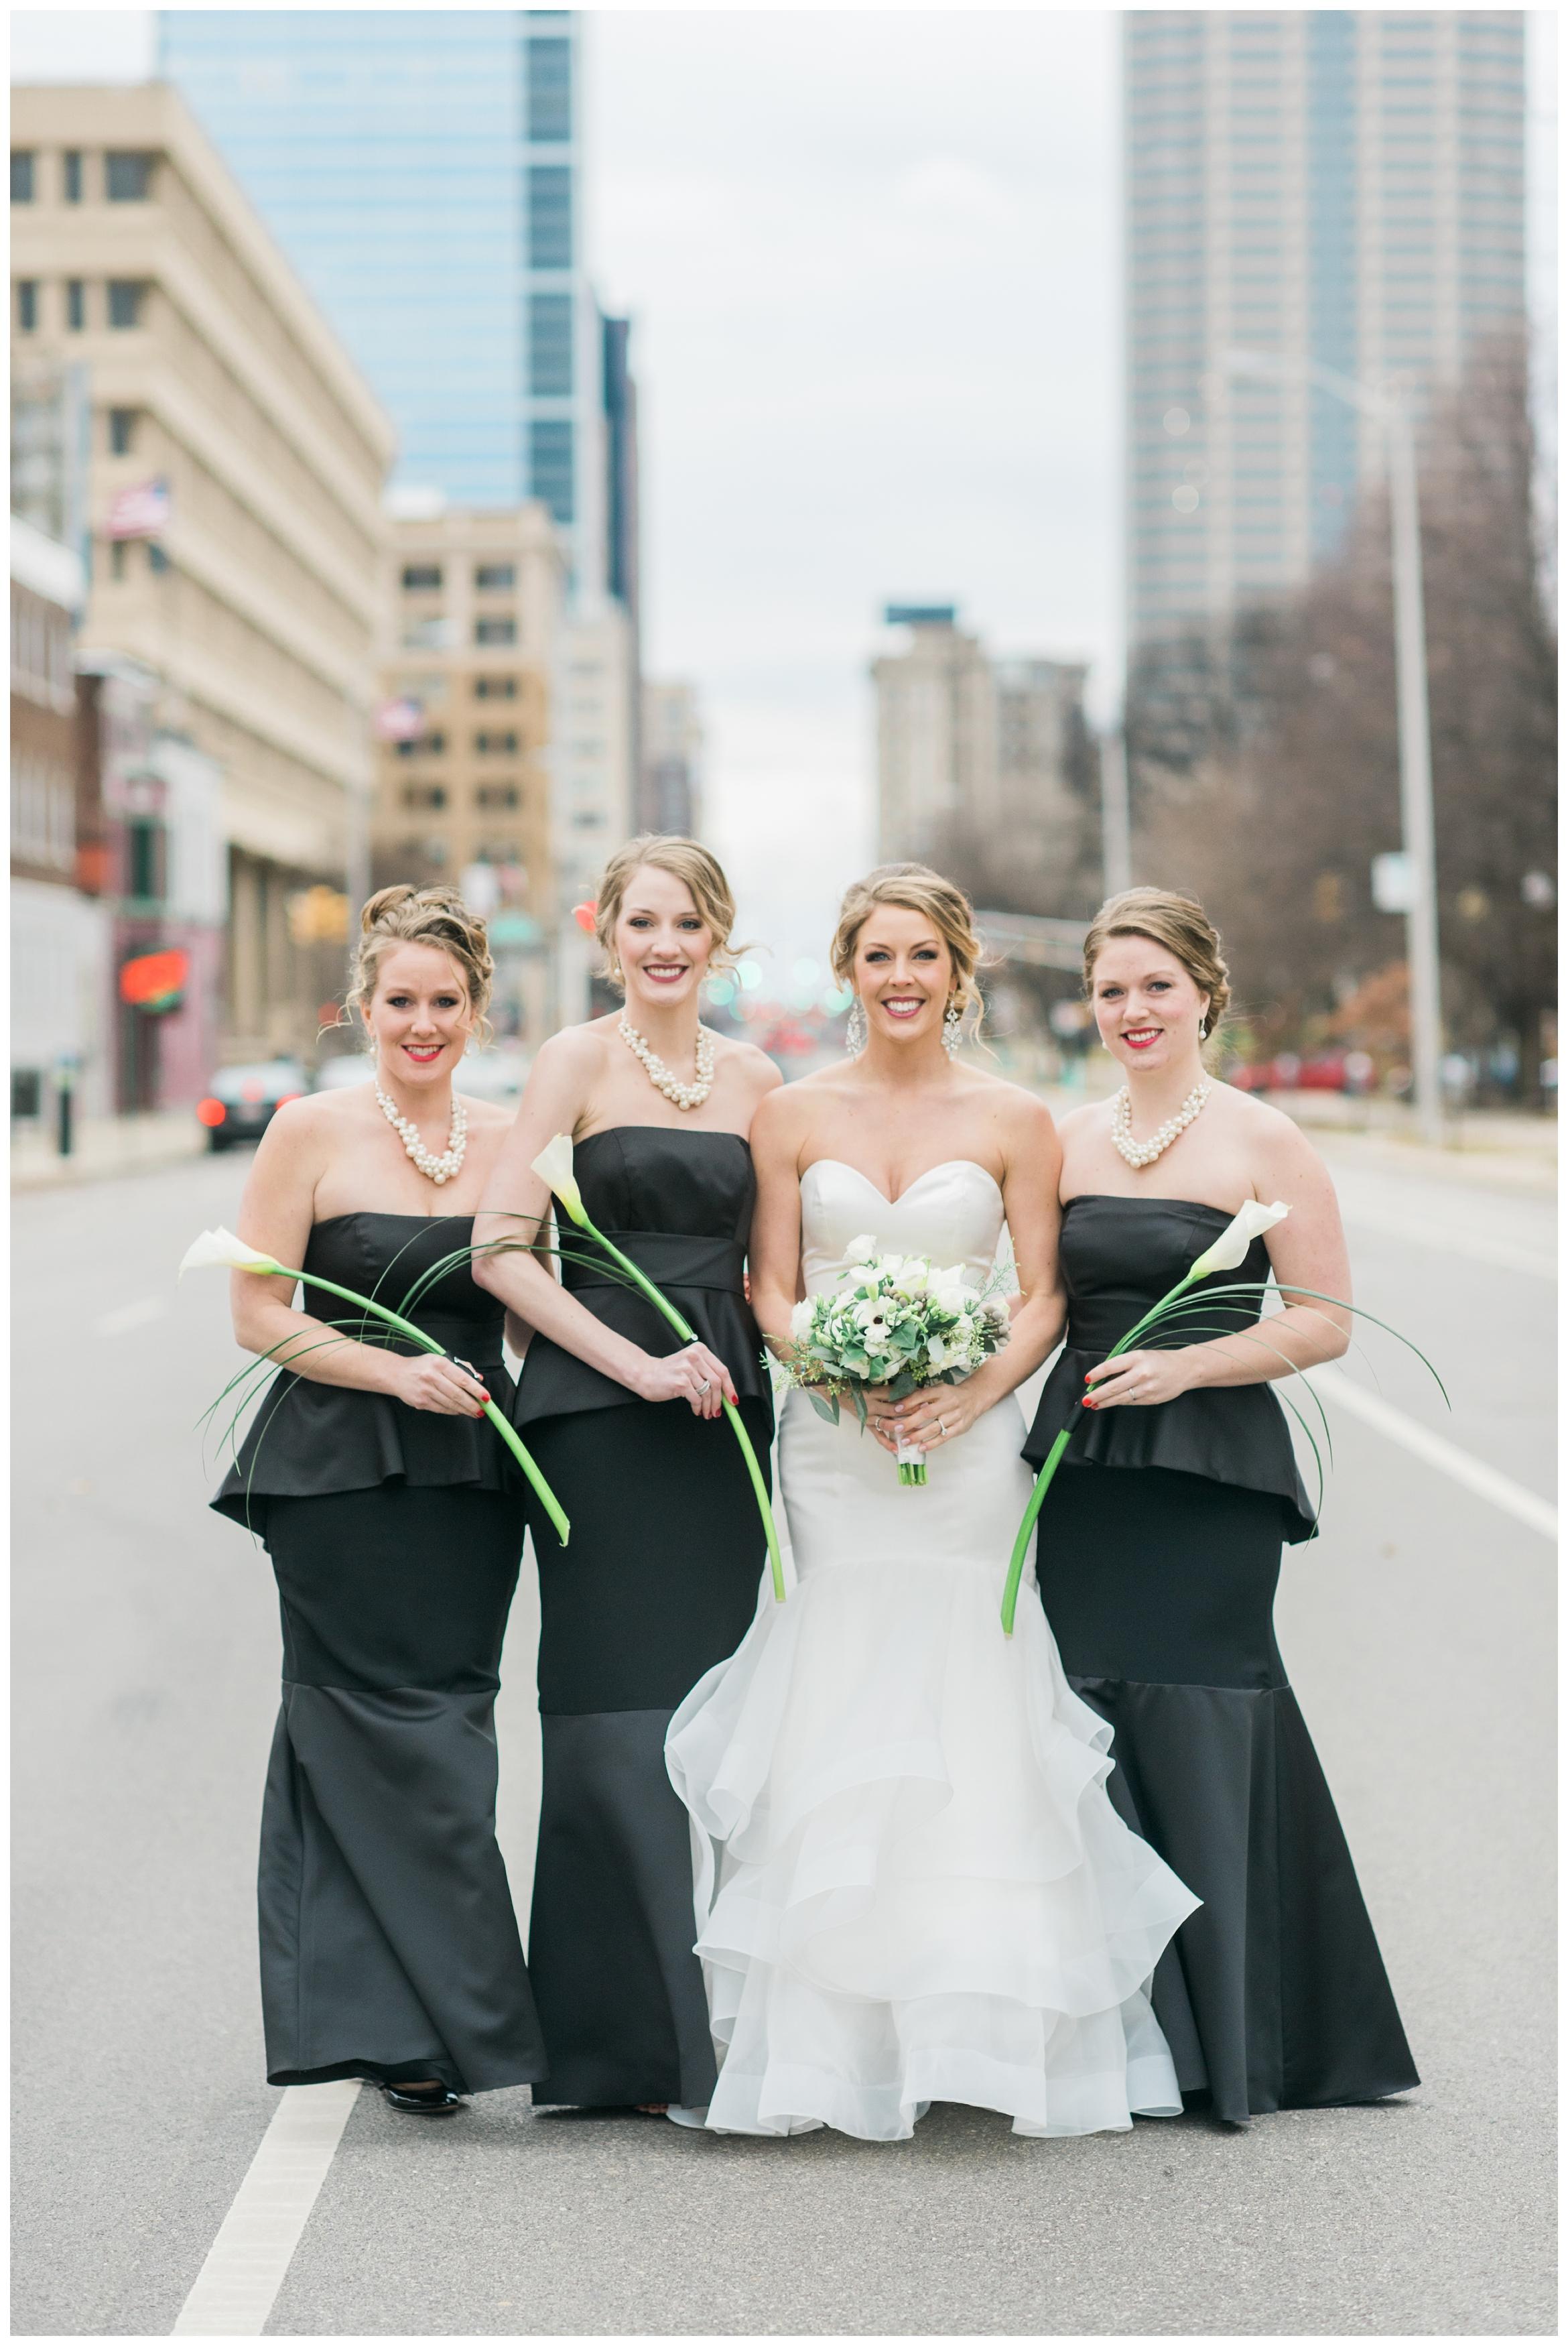 Rebecca_Bridges_Photography_Indianapolis_Wedding_Photographer_5813.jpg